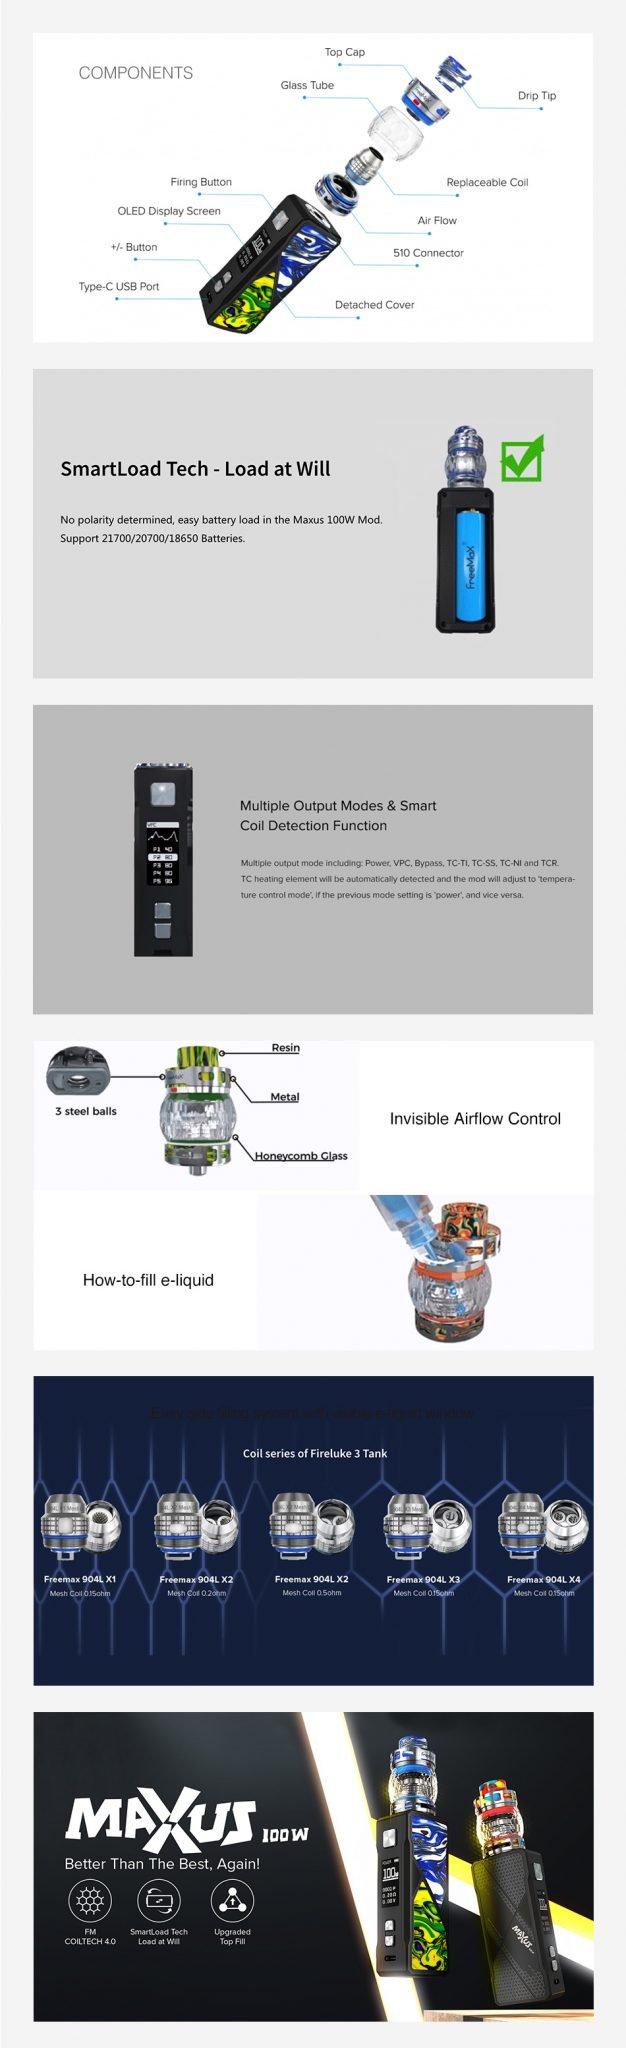 Freemax-Maxus-100W-TC-Kit-With-Fireluke-3-Tank-Features-UK